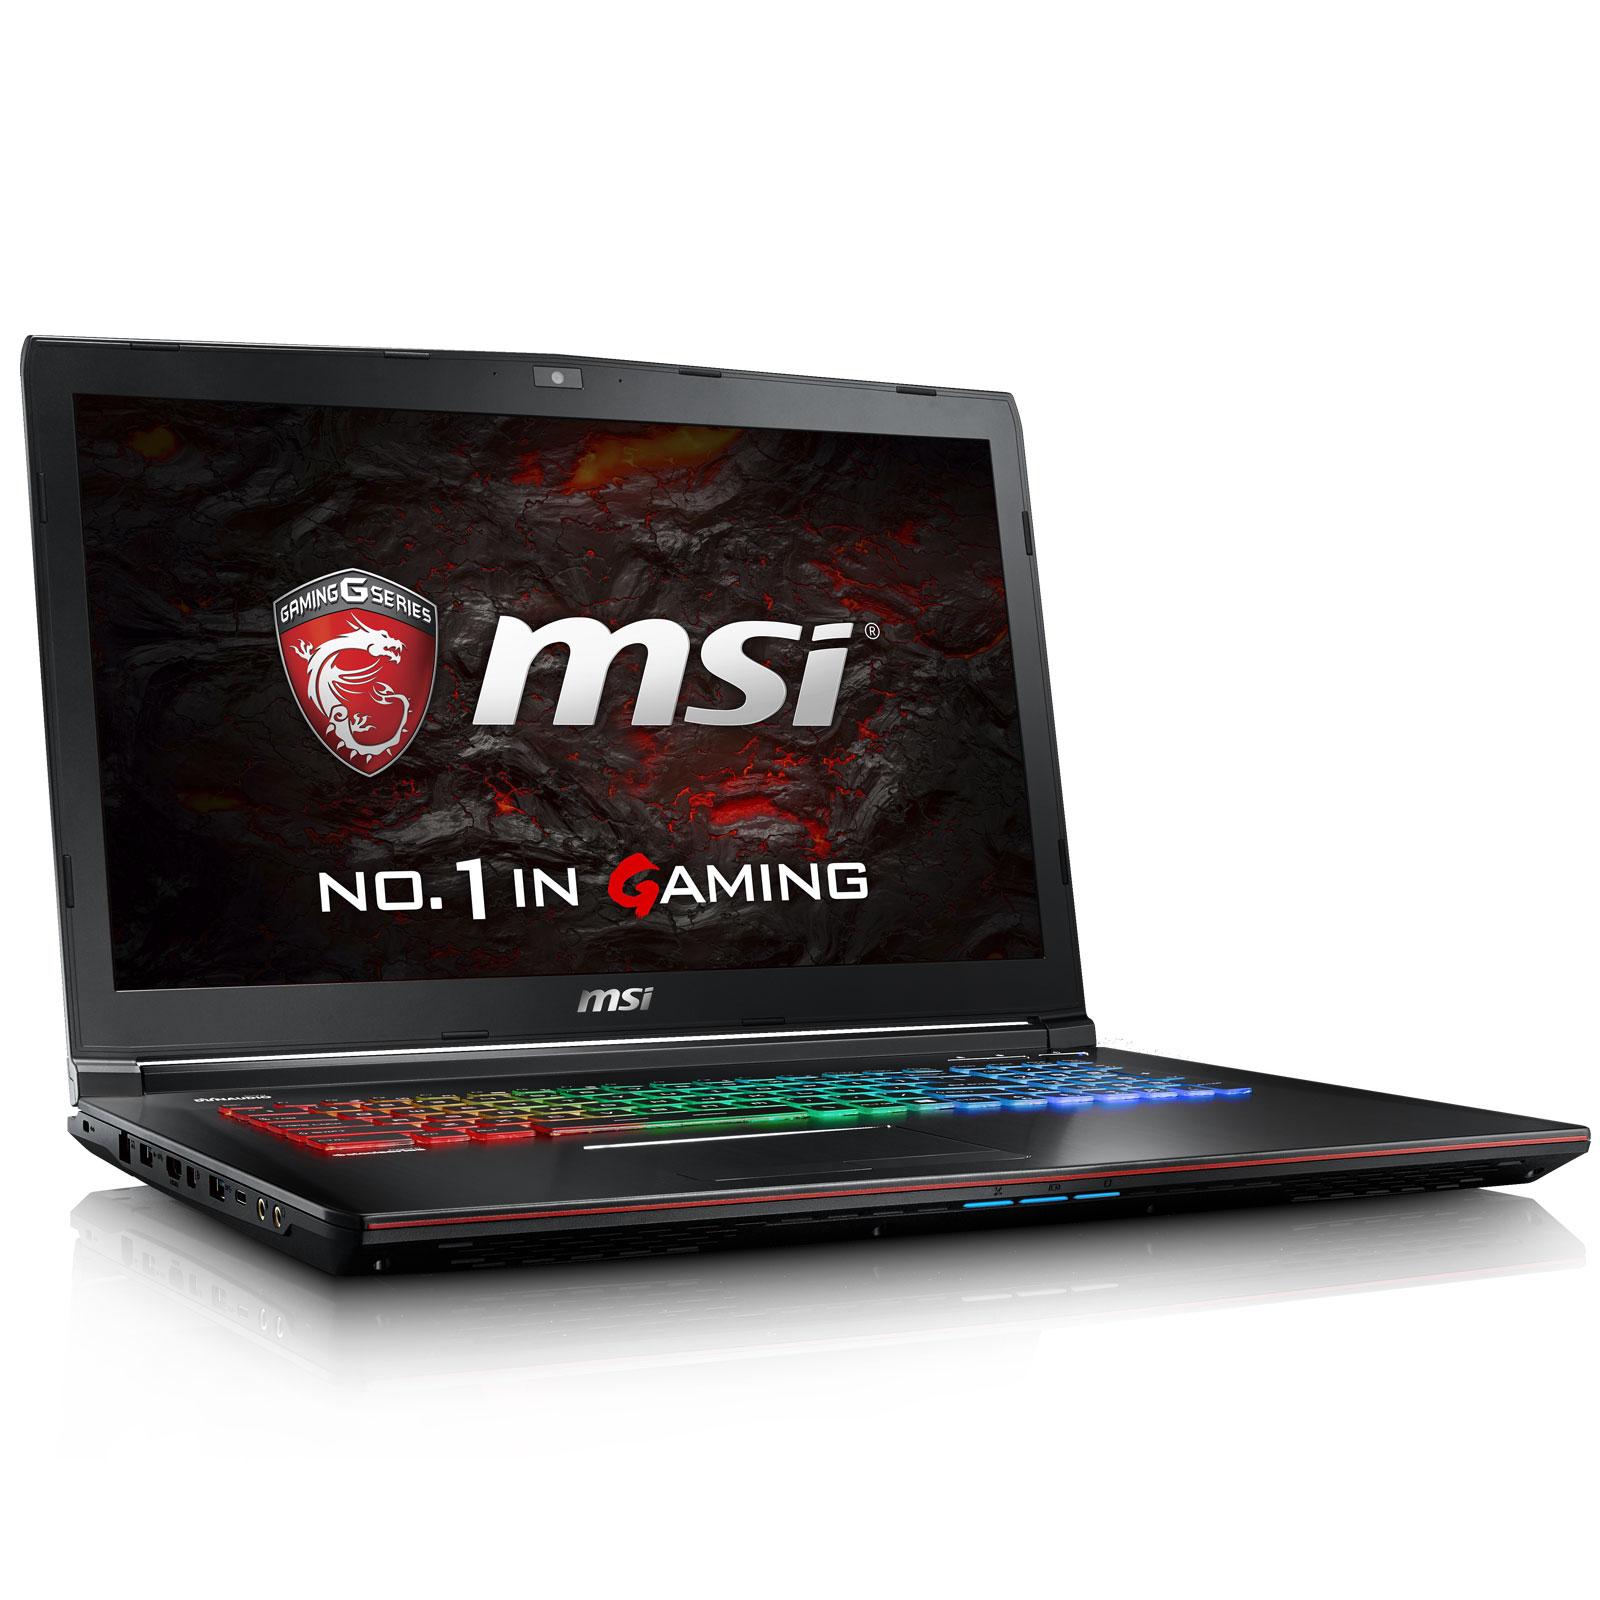 "PC portable MSI GE72VR 6RF-235XFR Apache Pro Intel Core i7-6700HQ 16 Go SSD 512 Go + HDD 1 To 17.3"" LED Full HD 120 Hz NVIDIA GeForce GTX 1060 3 Go Graveur DVD Wi-Fi AC/Bluetooth Webcam Free DOS (garantie constructeur 2 ans)"